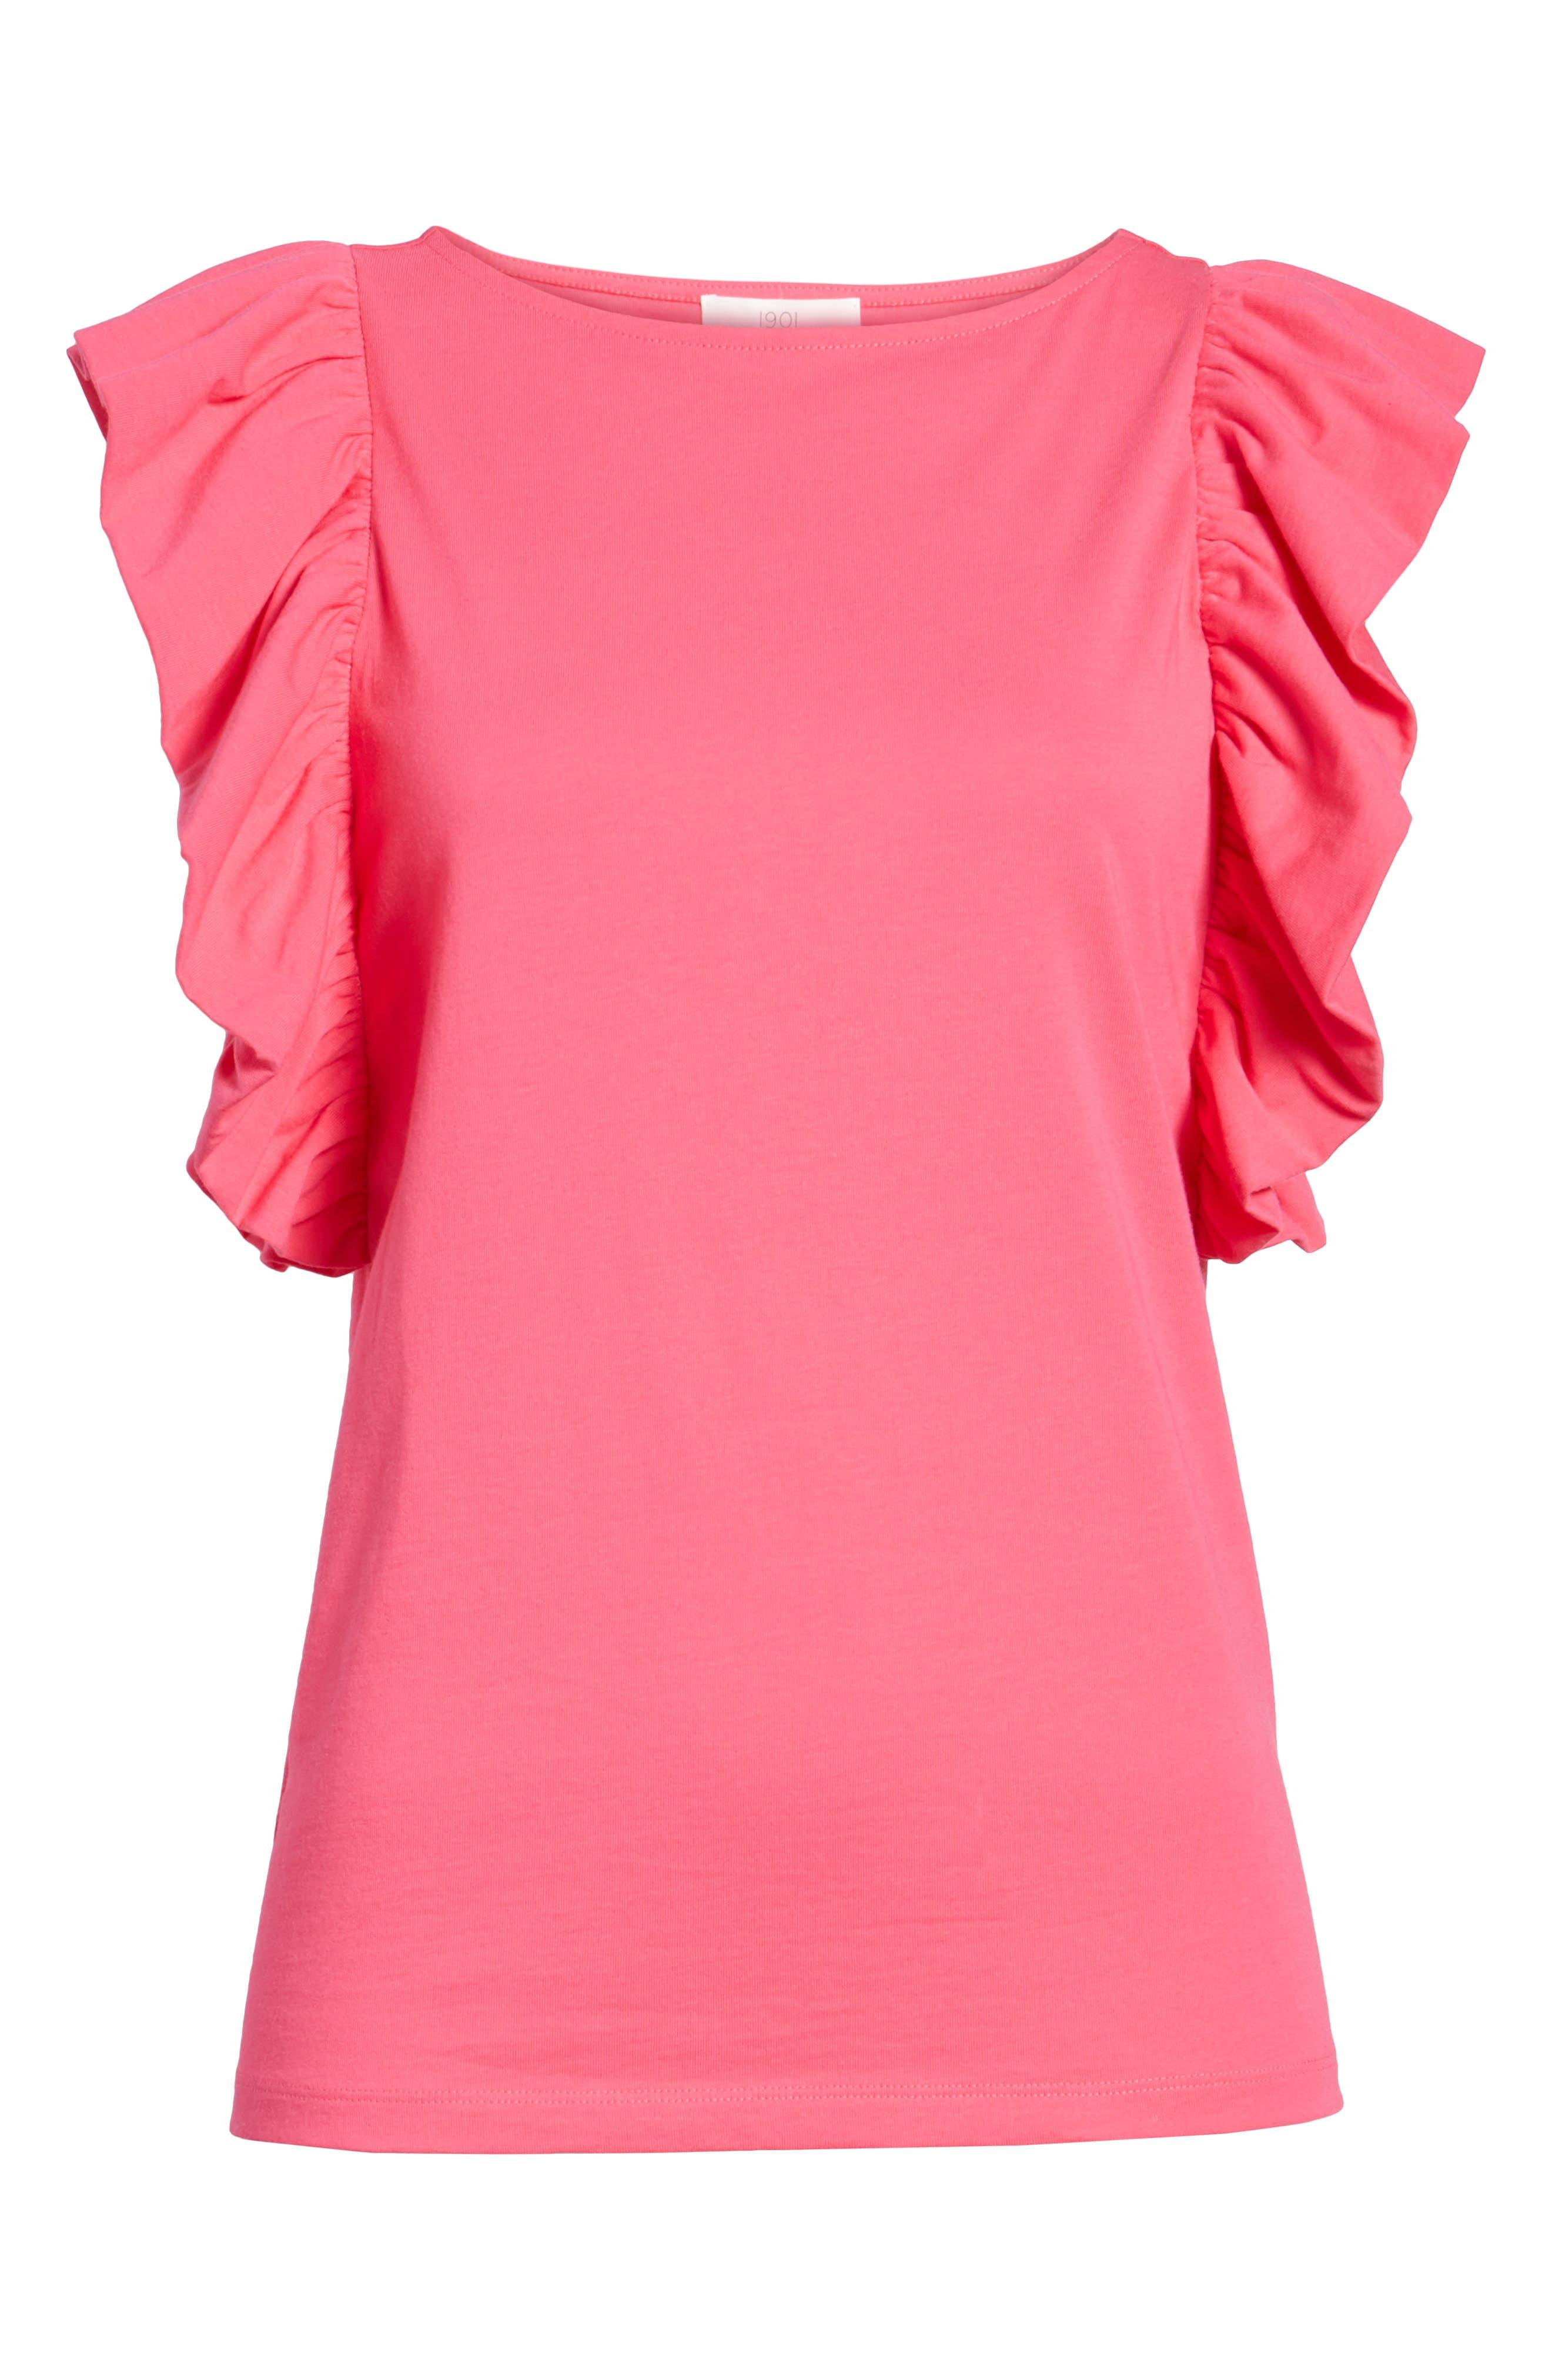 Ruffle Sleeve Tee,                             Alternate thumbnail 7, color,                             Pink Cabaret